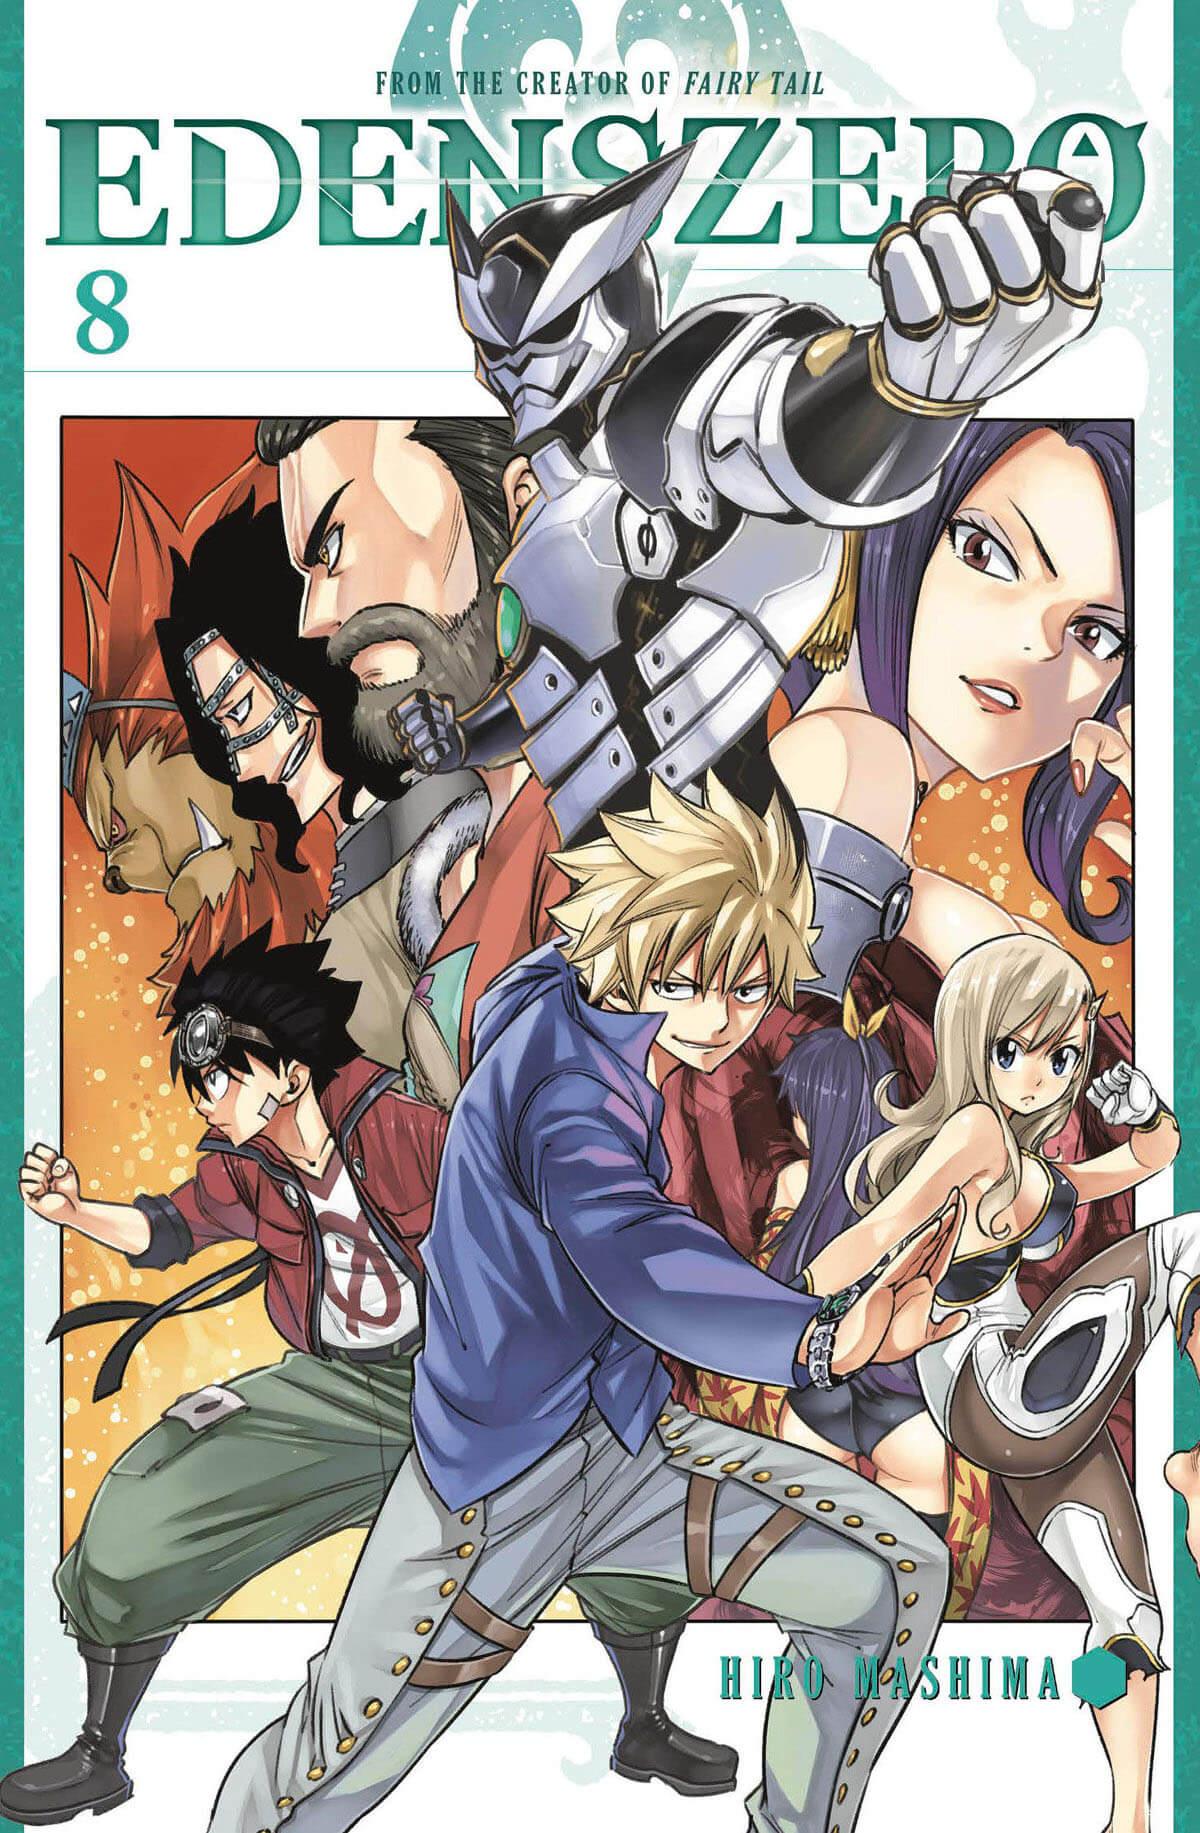 EDENS ZERO manga Volume 8 Cover